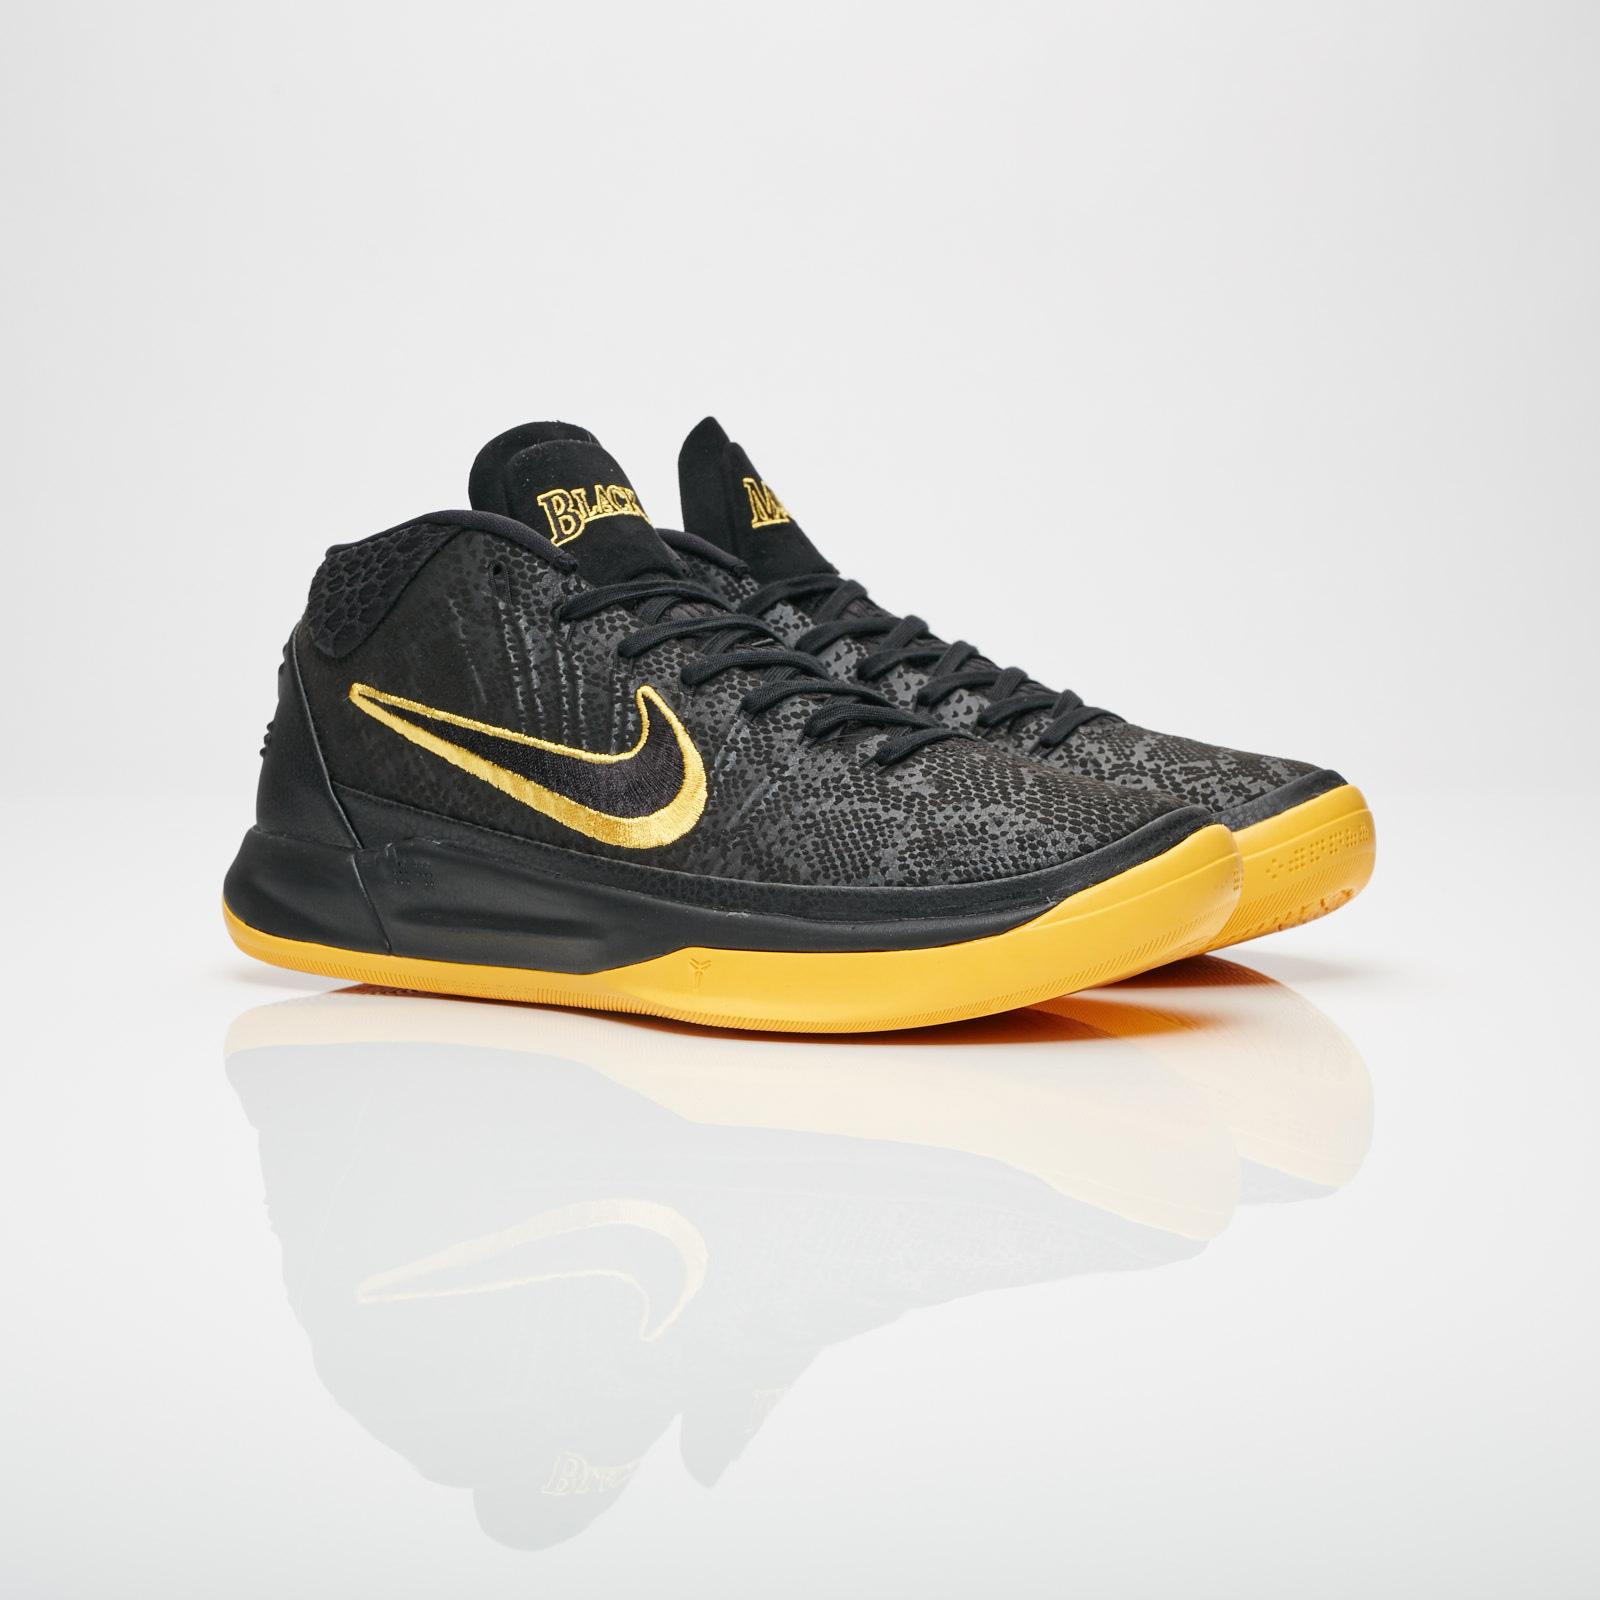 Nike Kobe AD BM - Aq5164-001